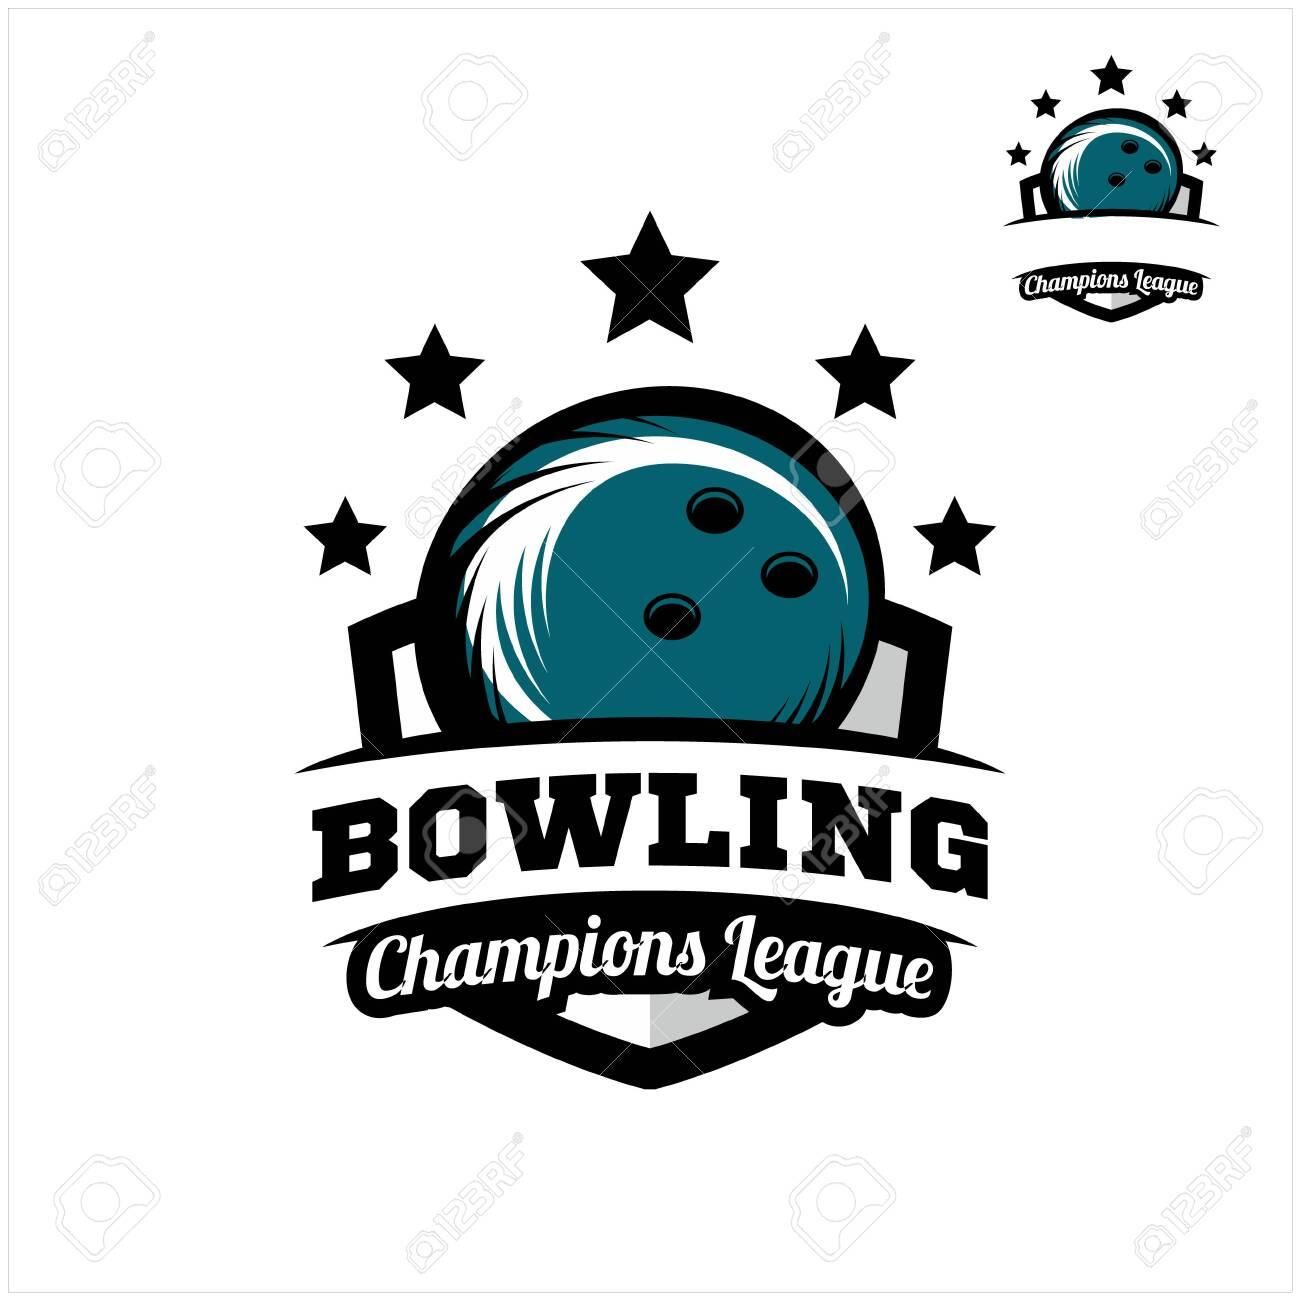 sport ball champions league logo vector royalty free cliparts vectors and stock illustration image 129994846 123rf com